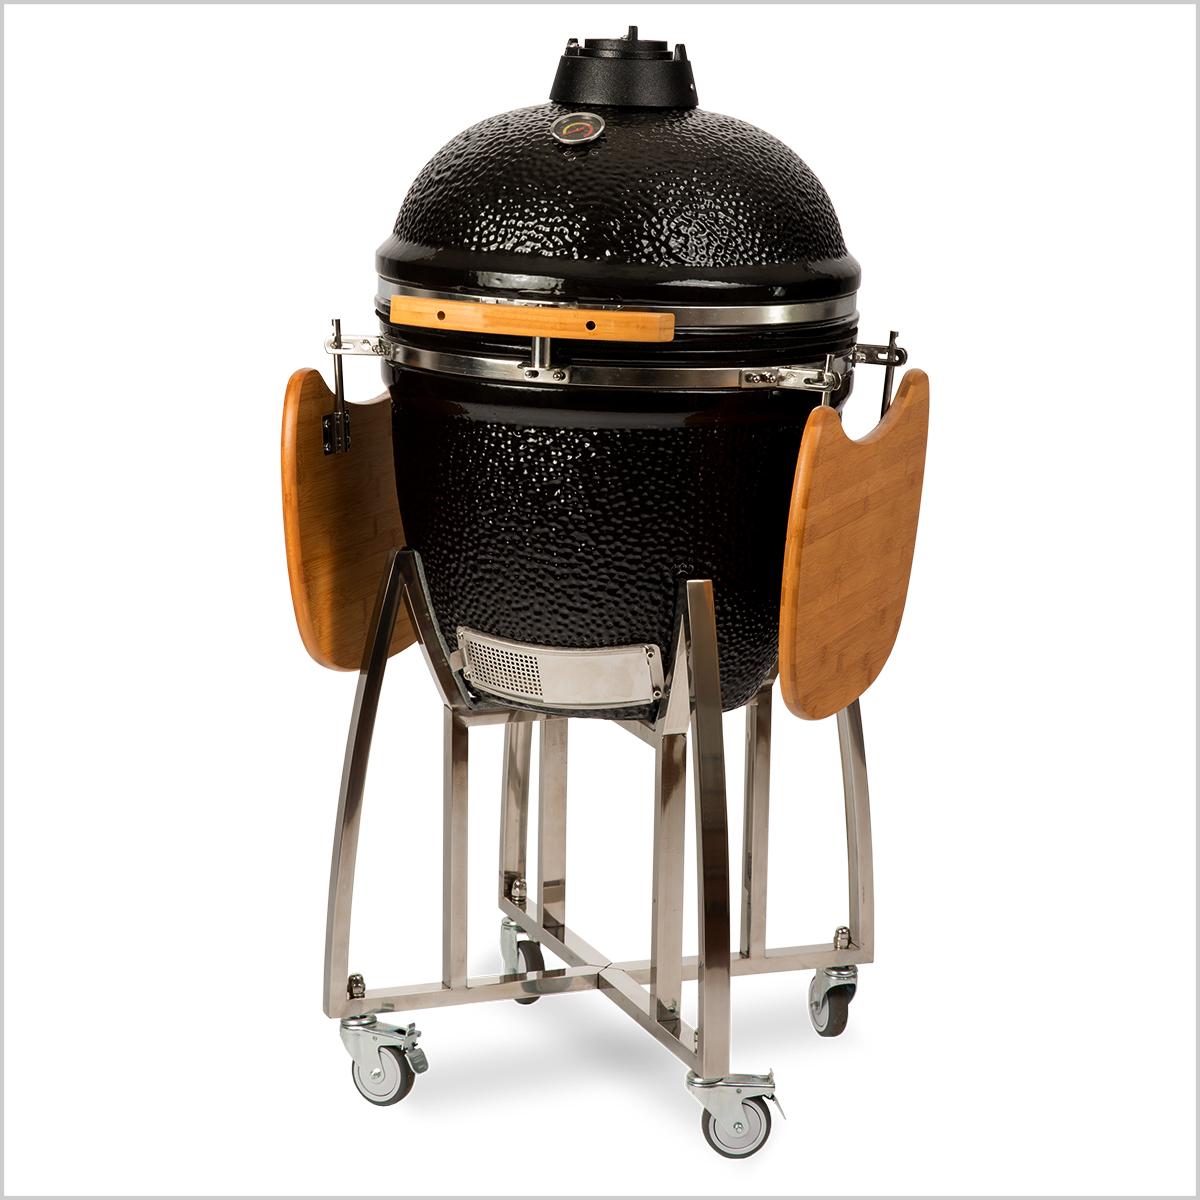 Patton Kamado 21 Inch.Auplex Kamado Large 21 Inch Keramische Barbecue